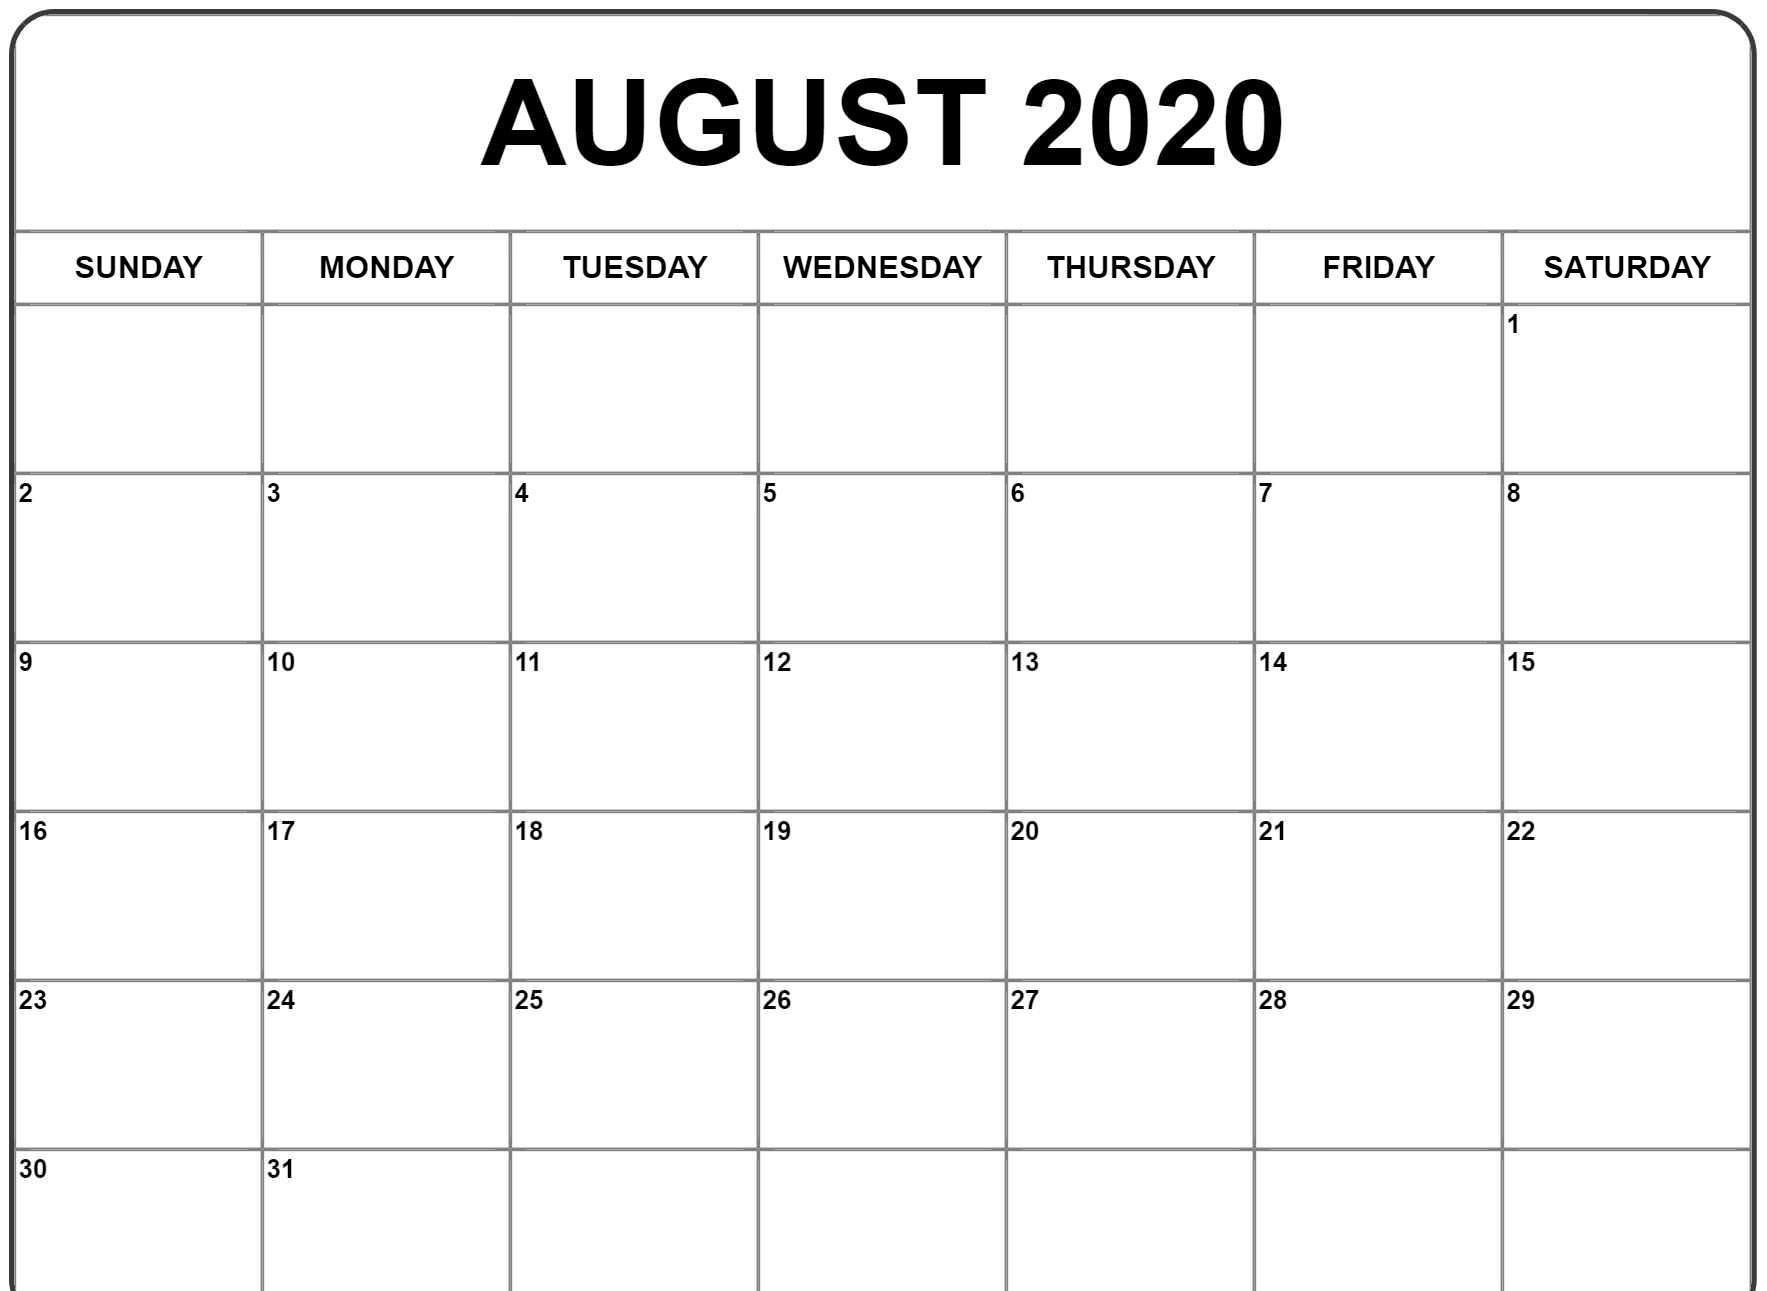 August 2020 Calendar In 2020 | Monthly Calendar Printable regarding 8.5 X 11 Free Printable Monthly Calendar 2020